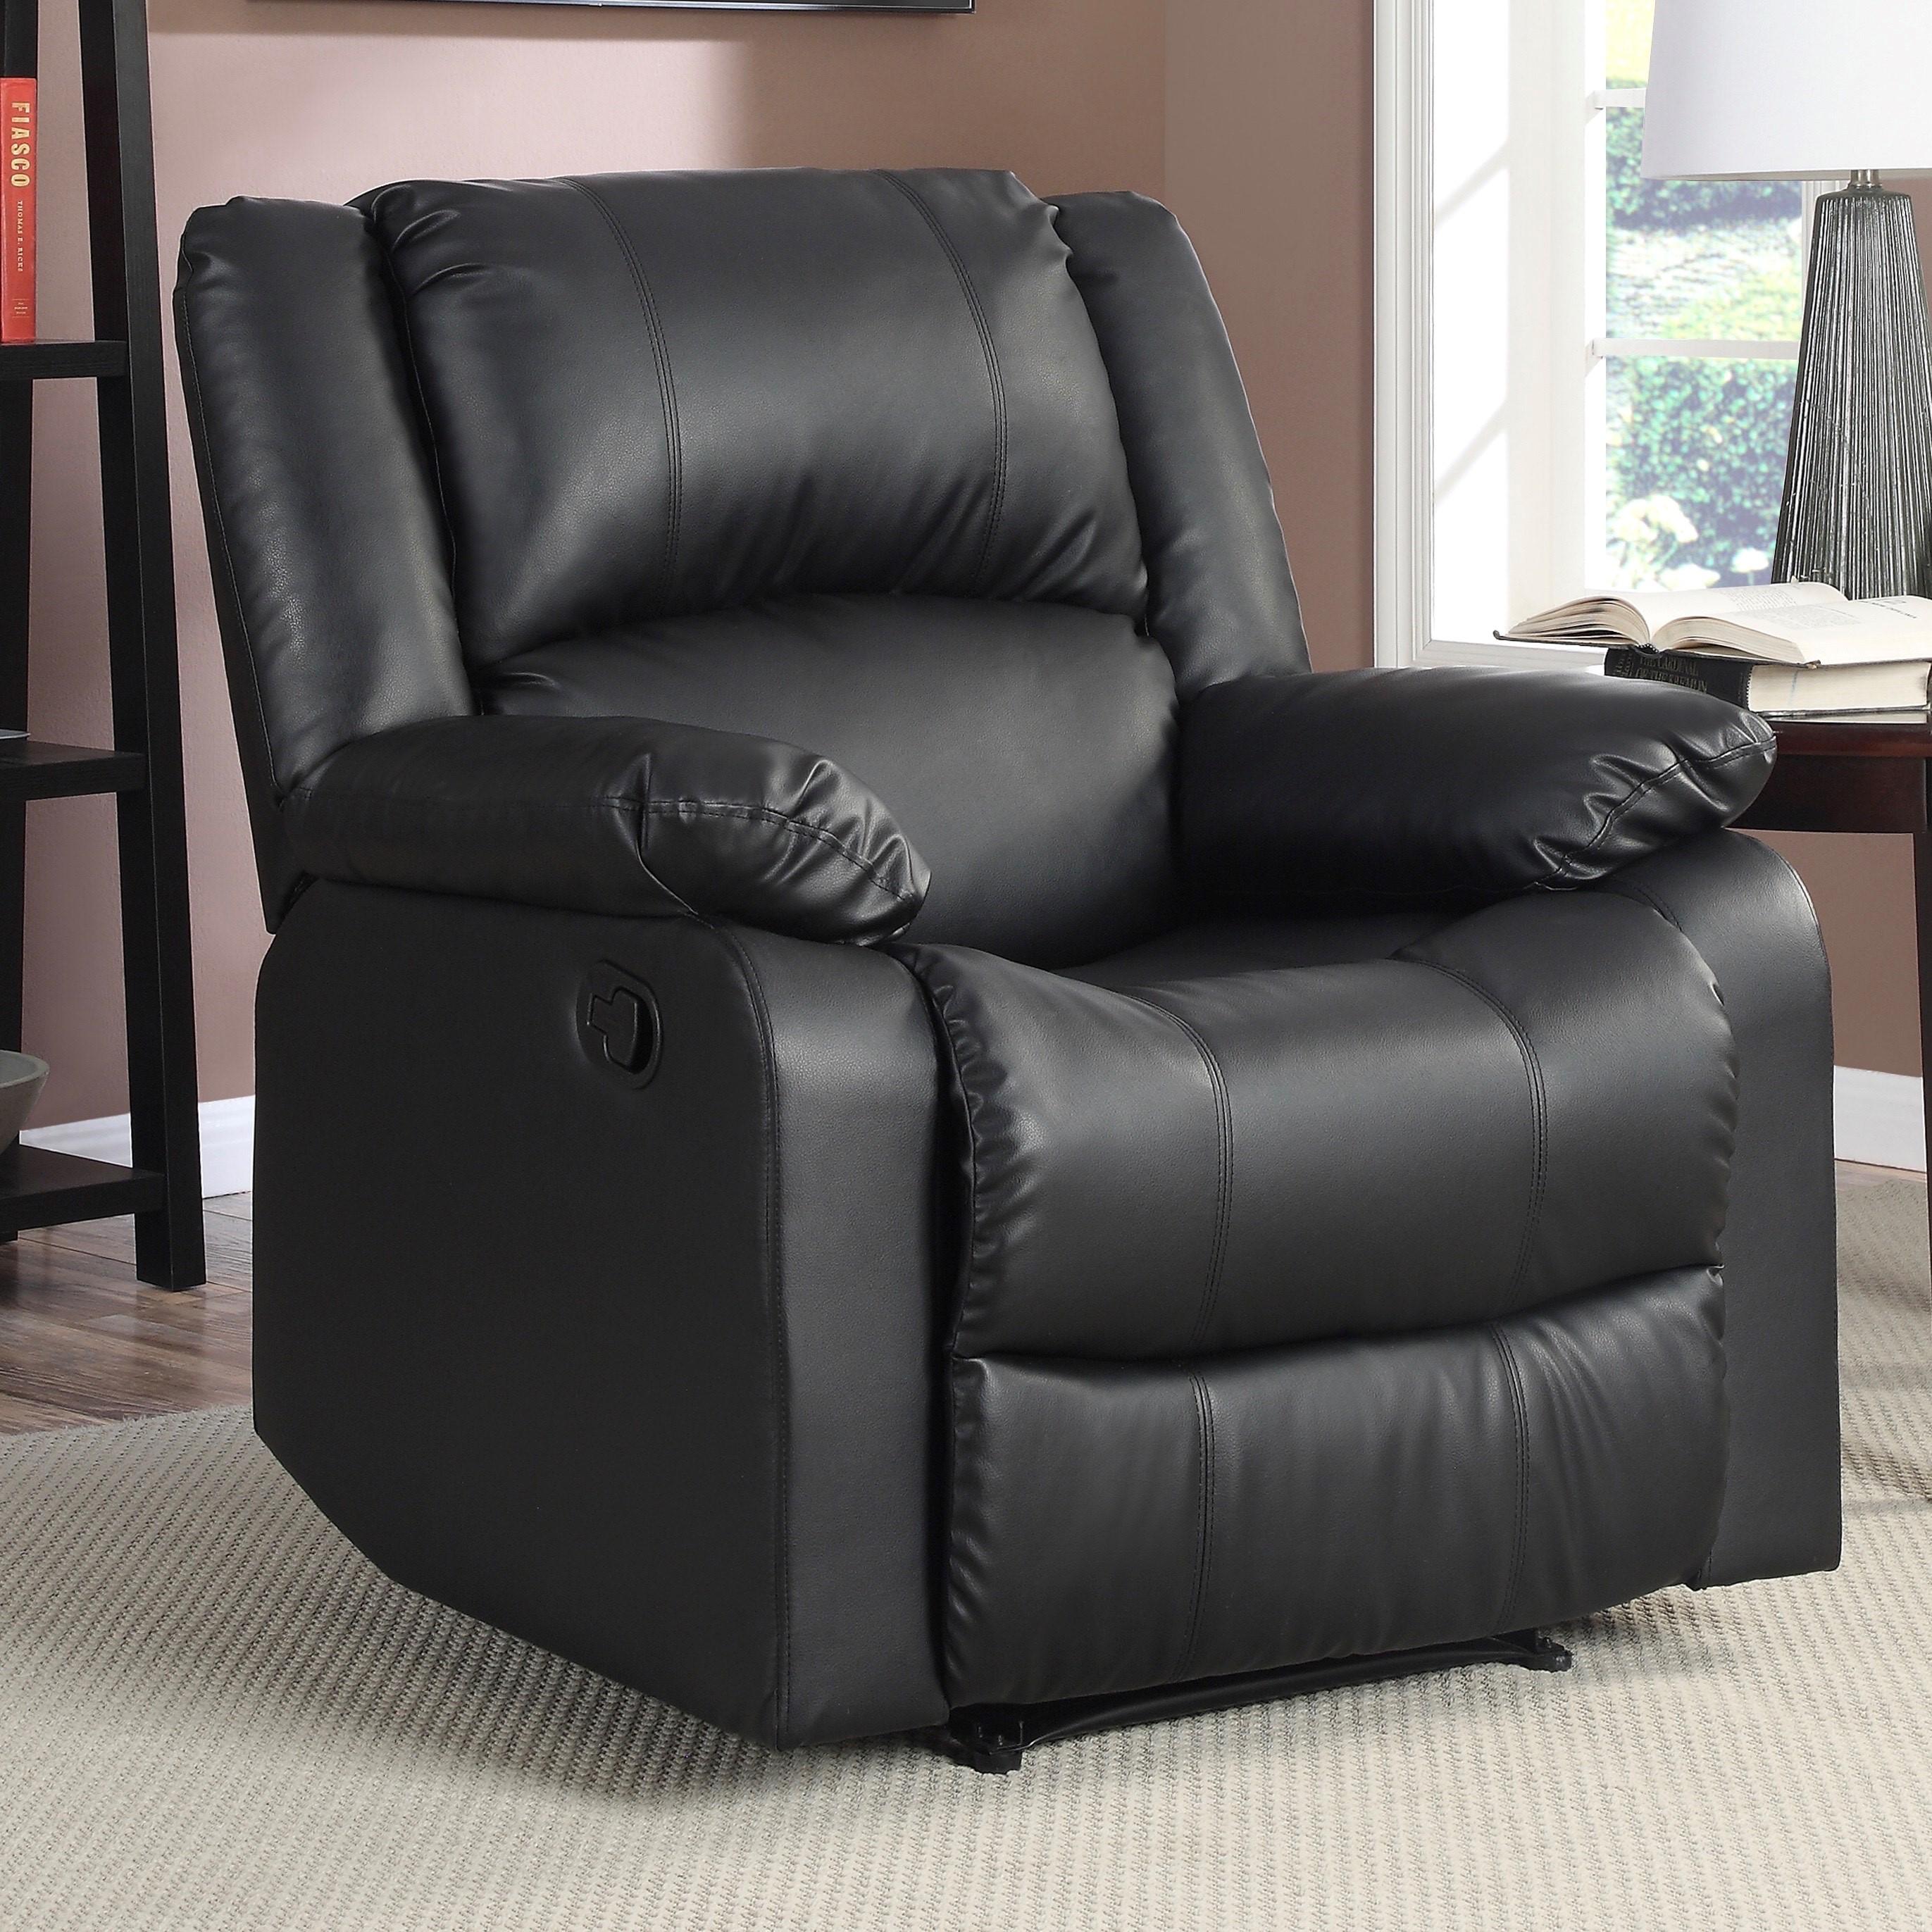 Warren Recliner Single Chair (2 colors) $200 + Free shipping